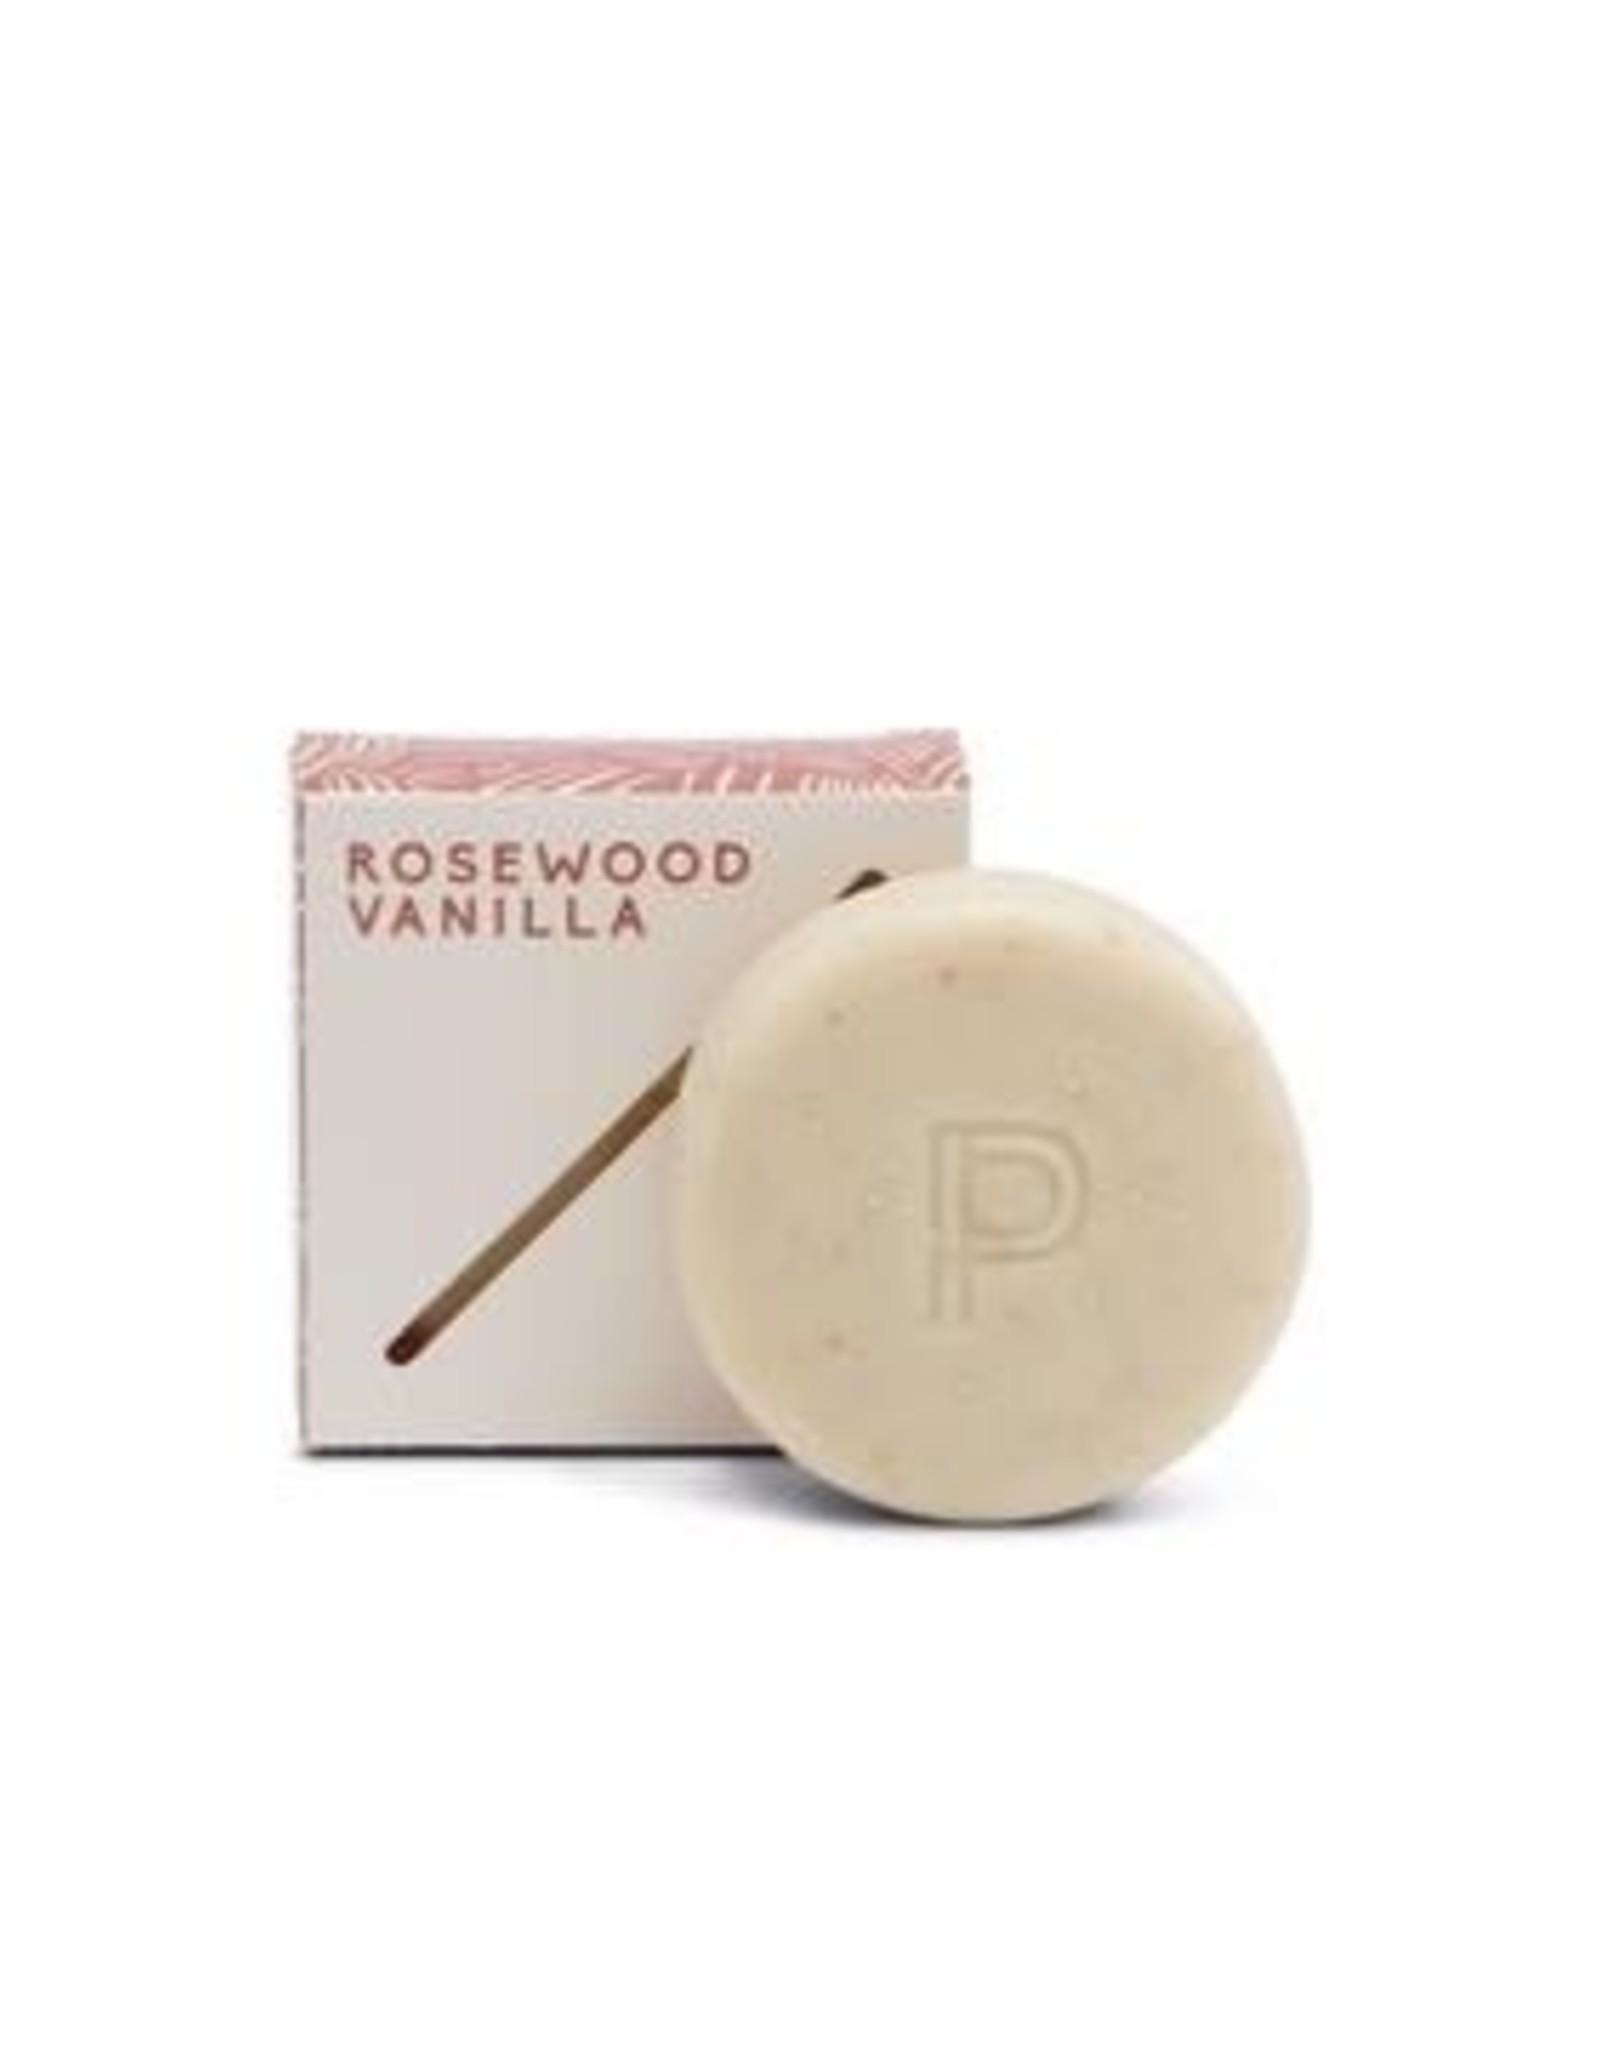 PAX - Soap/Rosewood Vanilla Oatmeal